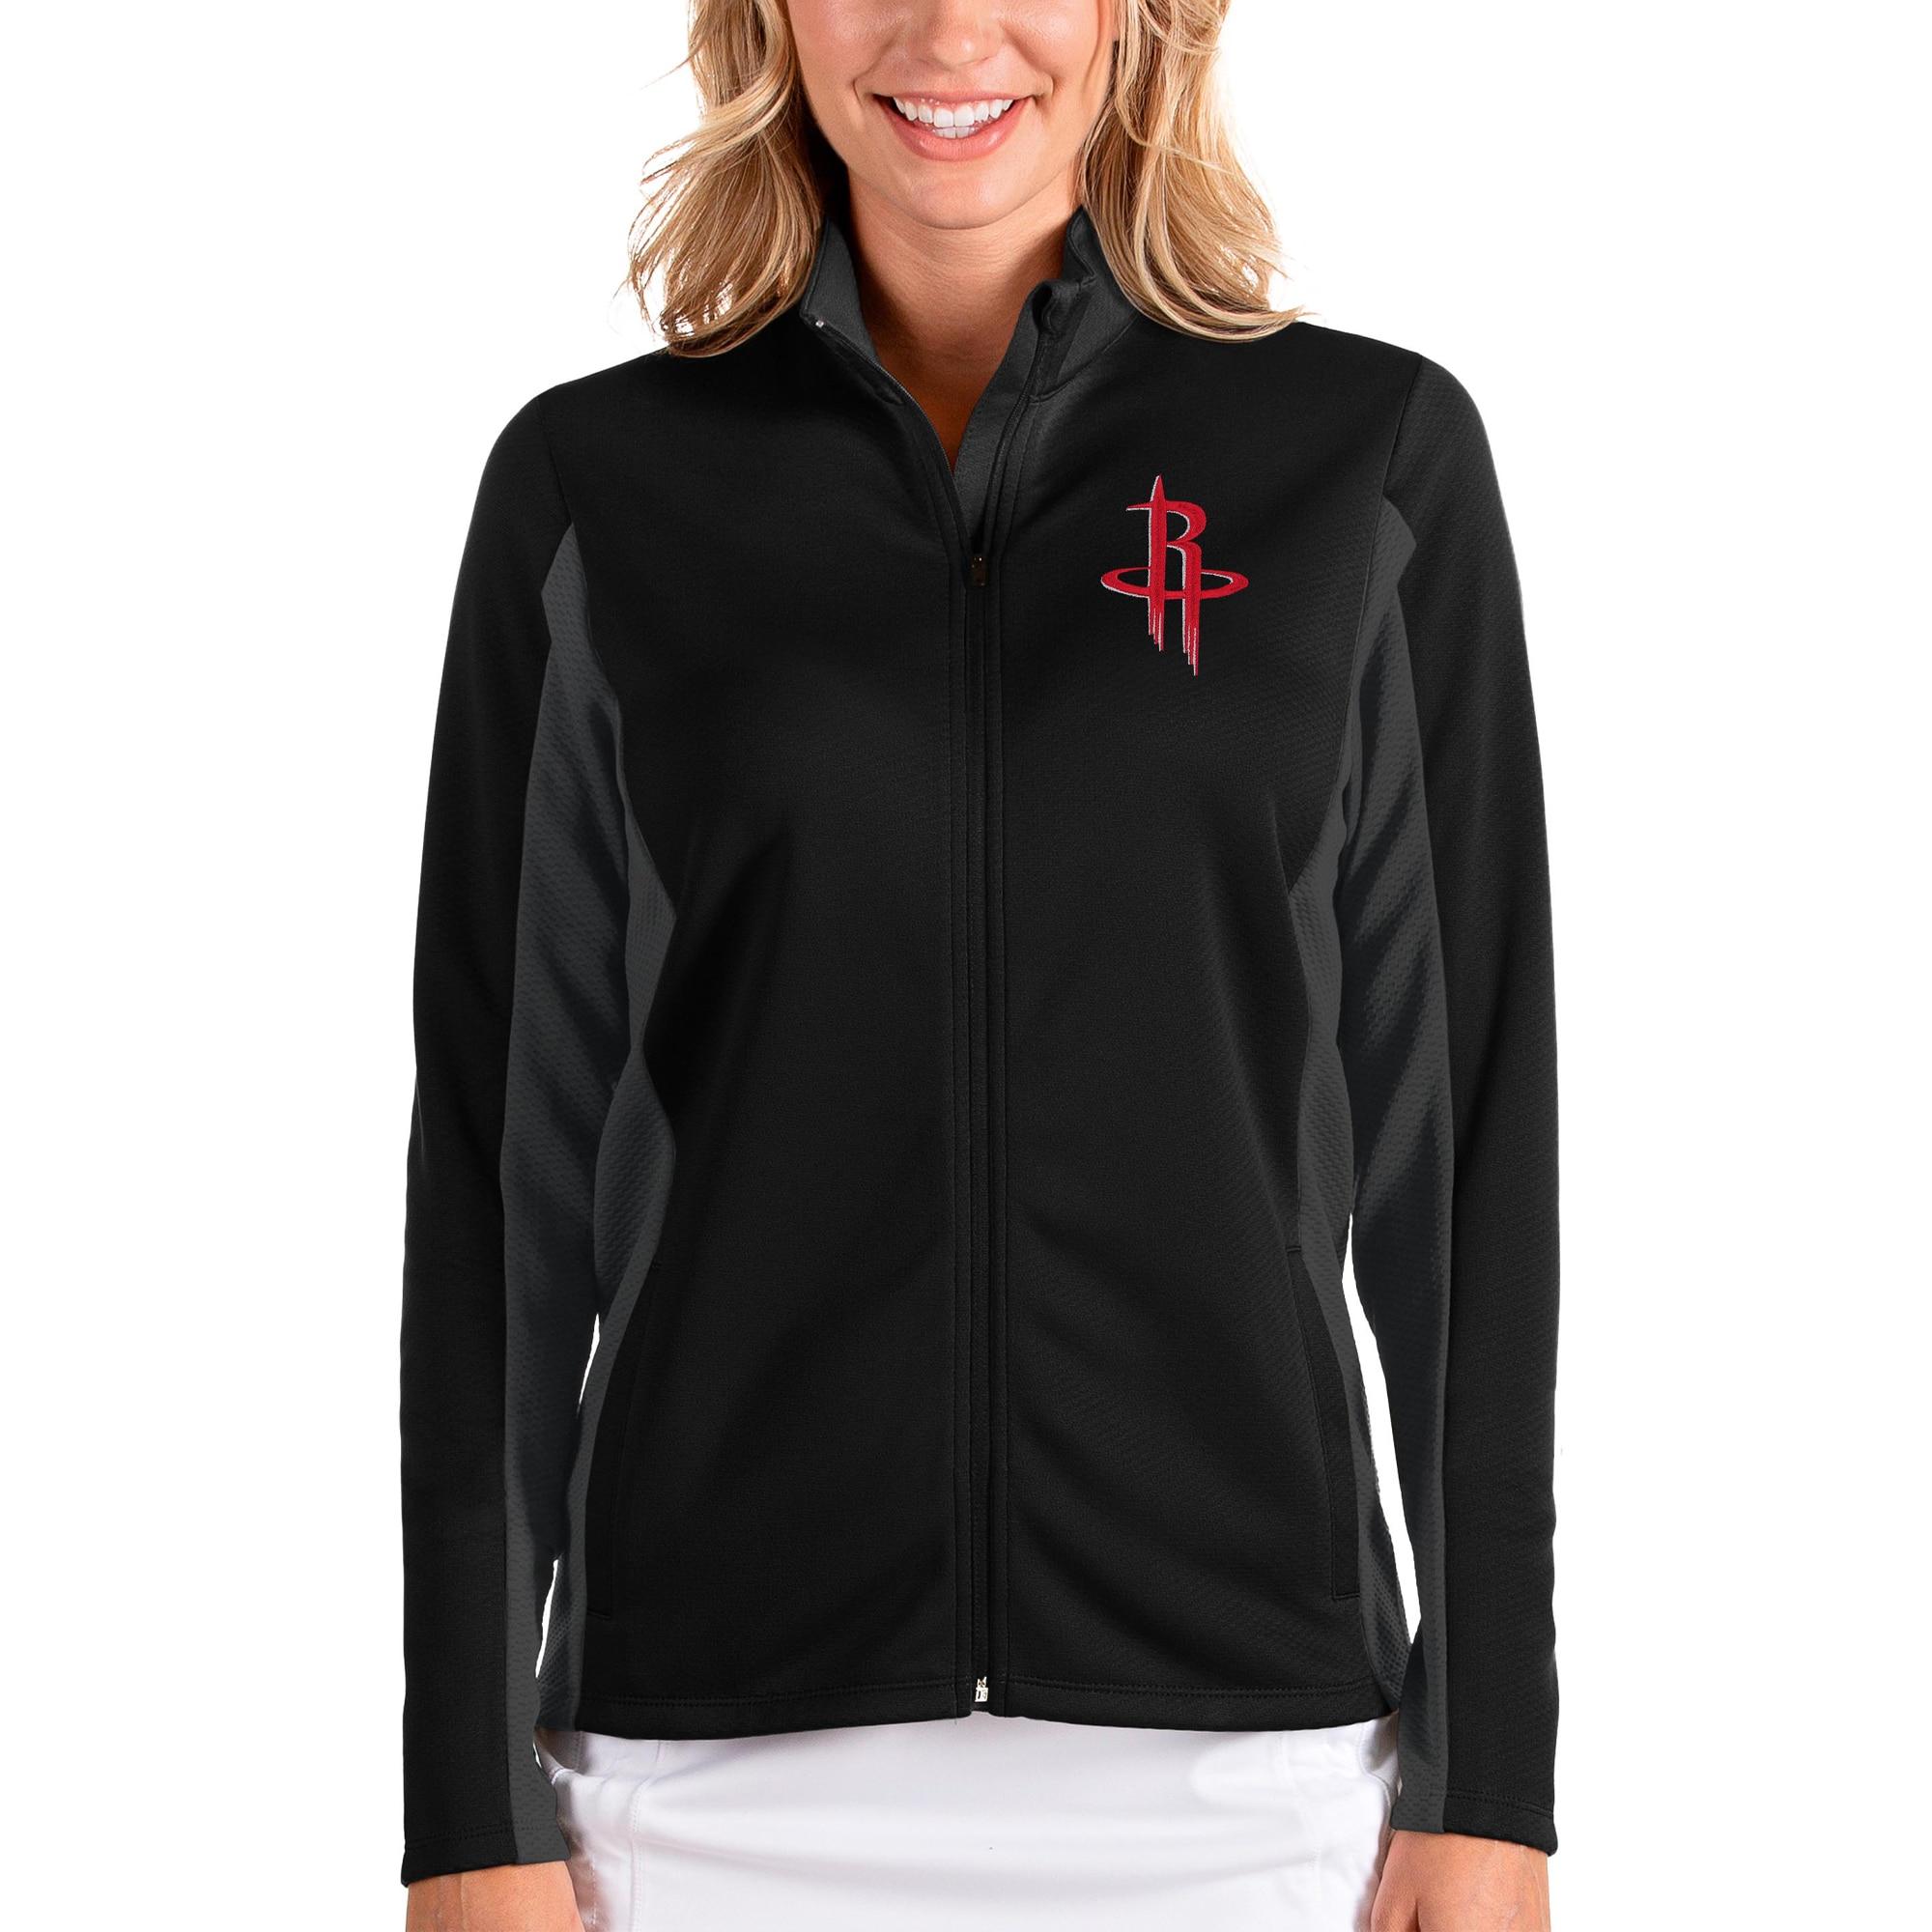 Houston Rockets Antigua Women's Passage Full-Zip Jacket - Black/Charcoal